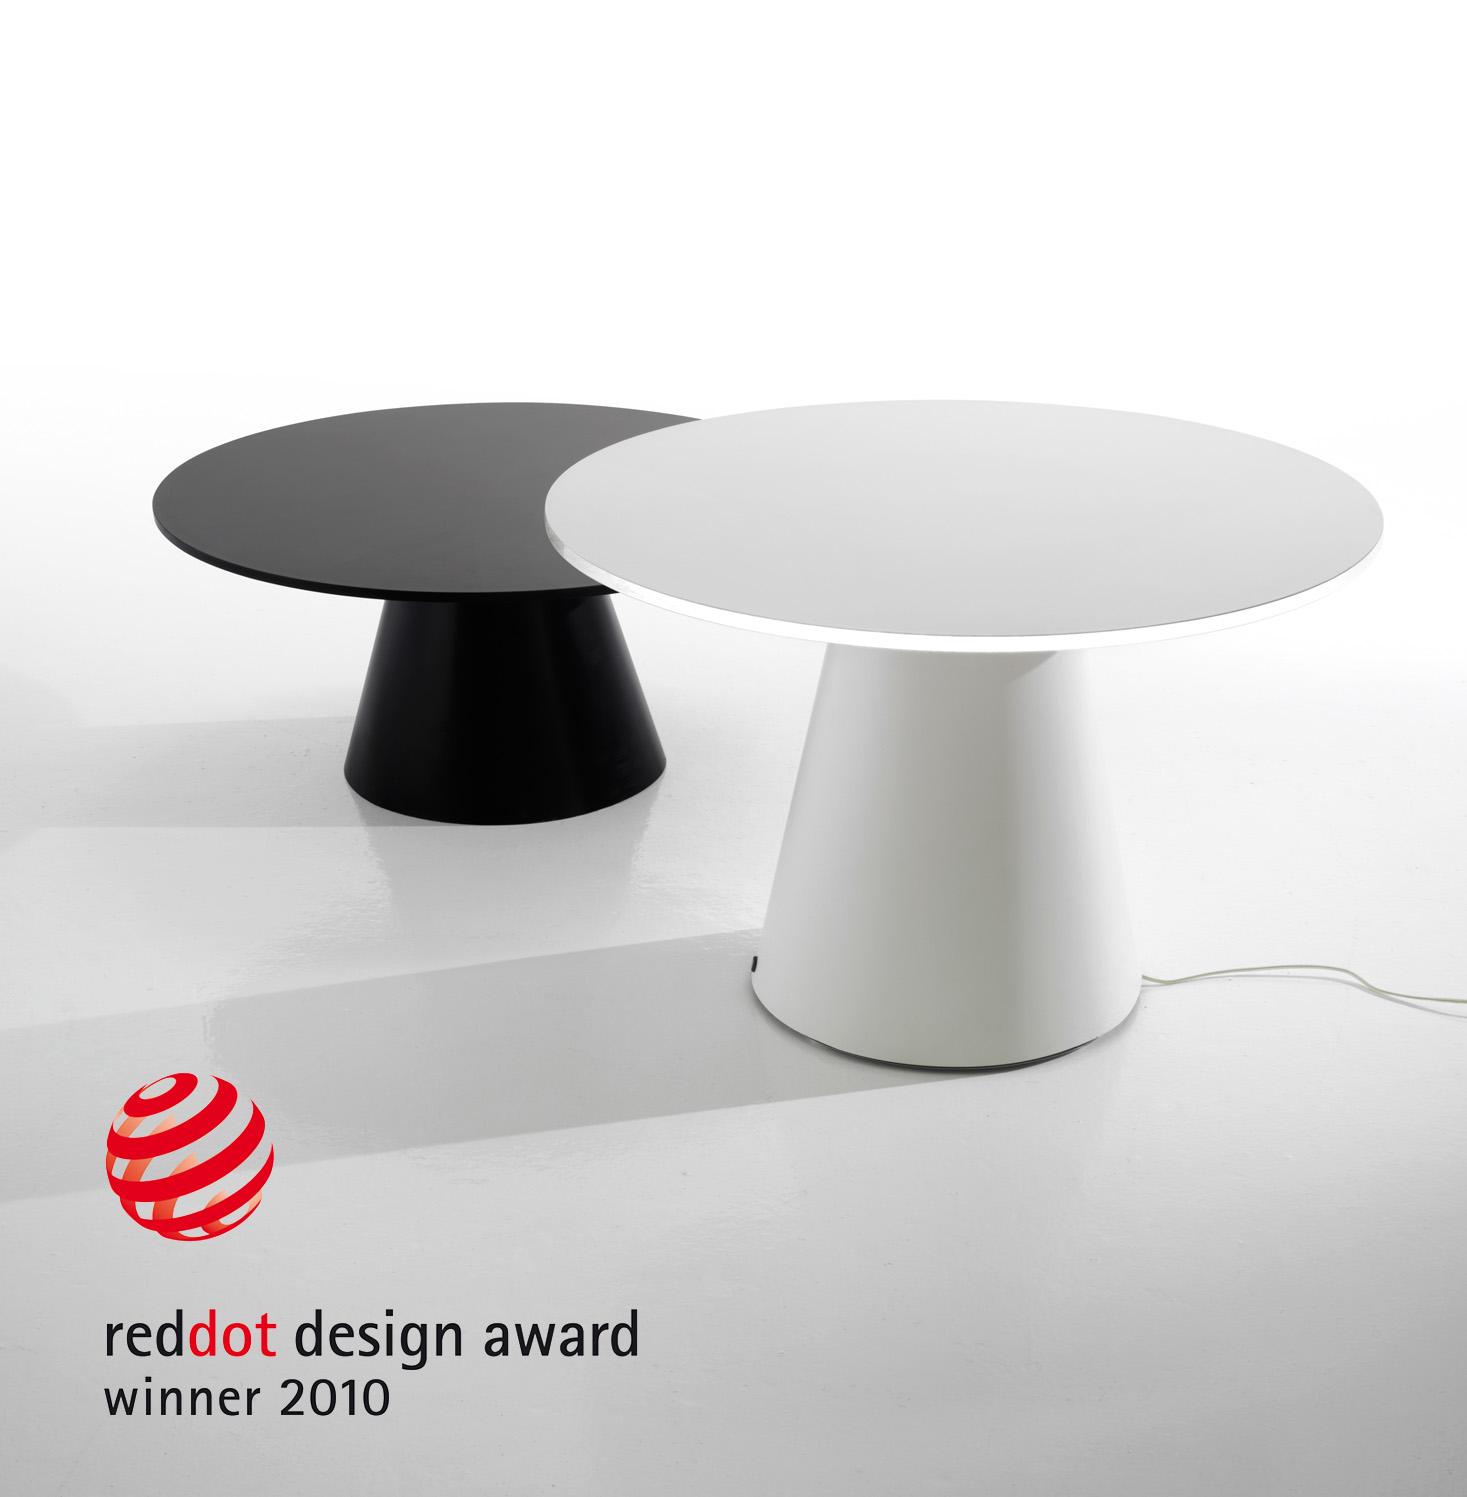 red dot design award - photo #45